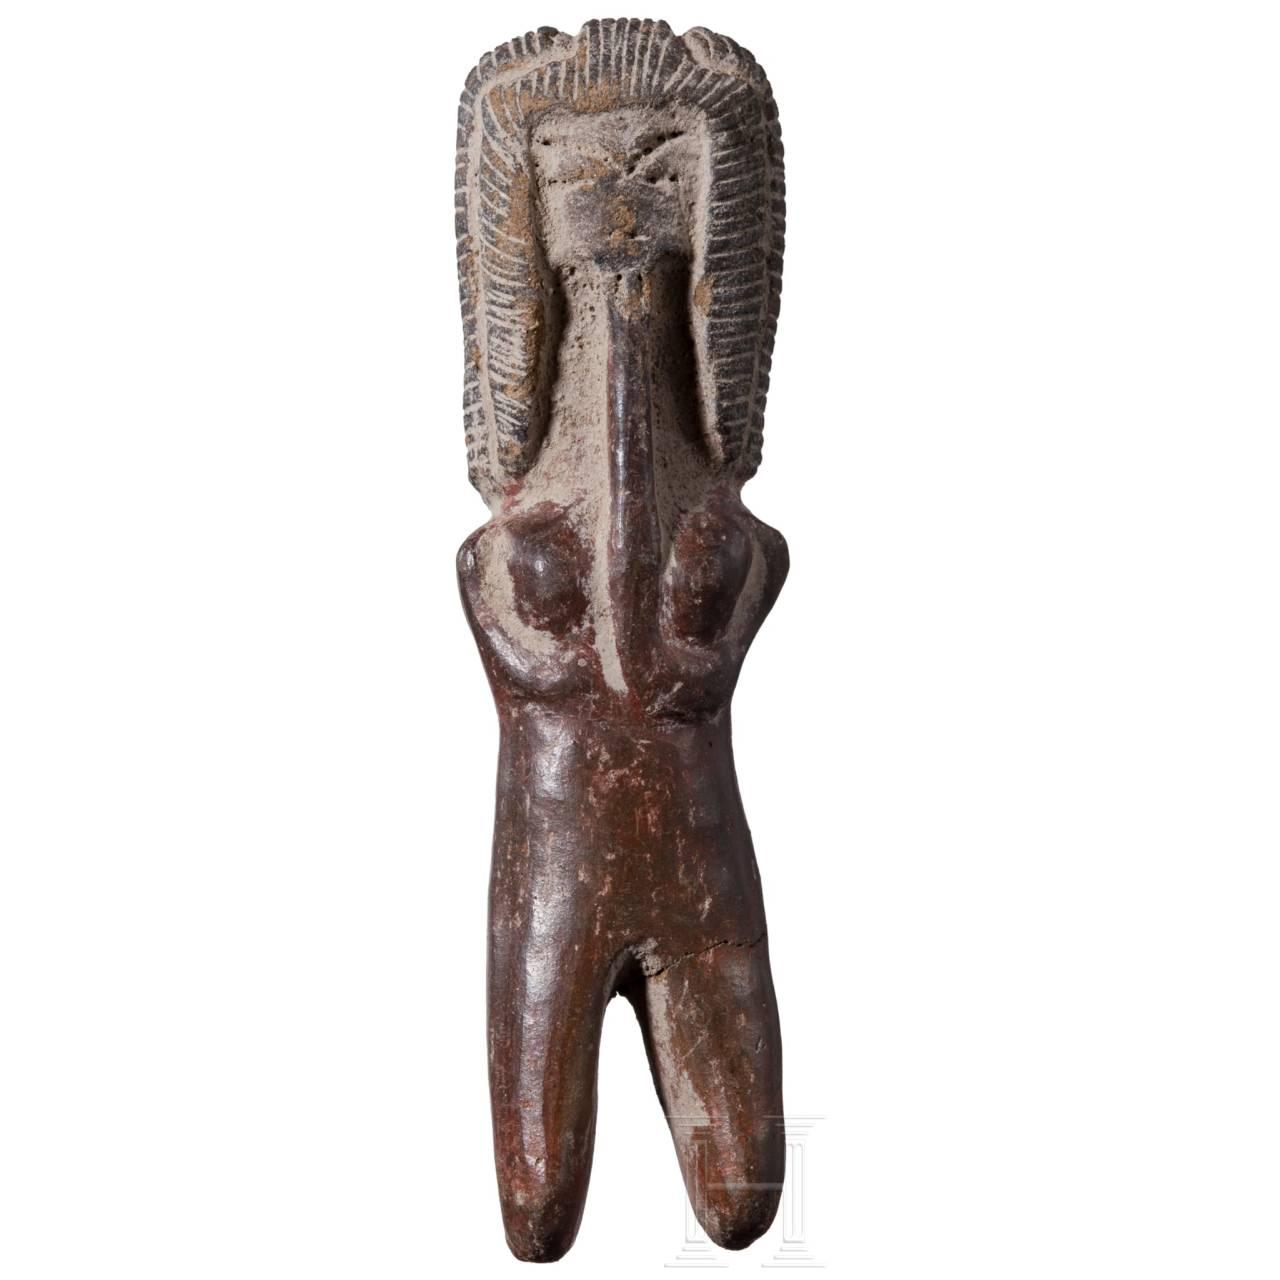 Kleinterrakotta in Form einer Flötenspielerin, Valdivia-Kultur, Ecuador, ca. 2500 – 2000 v. Chr.